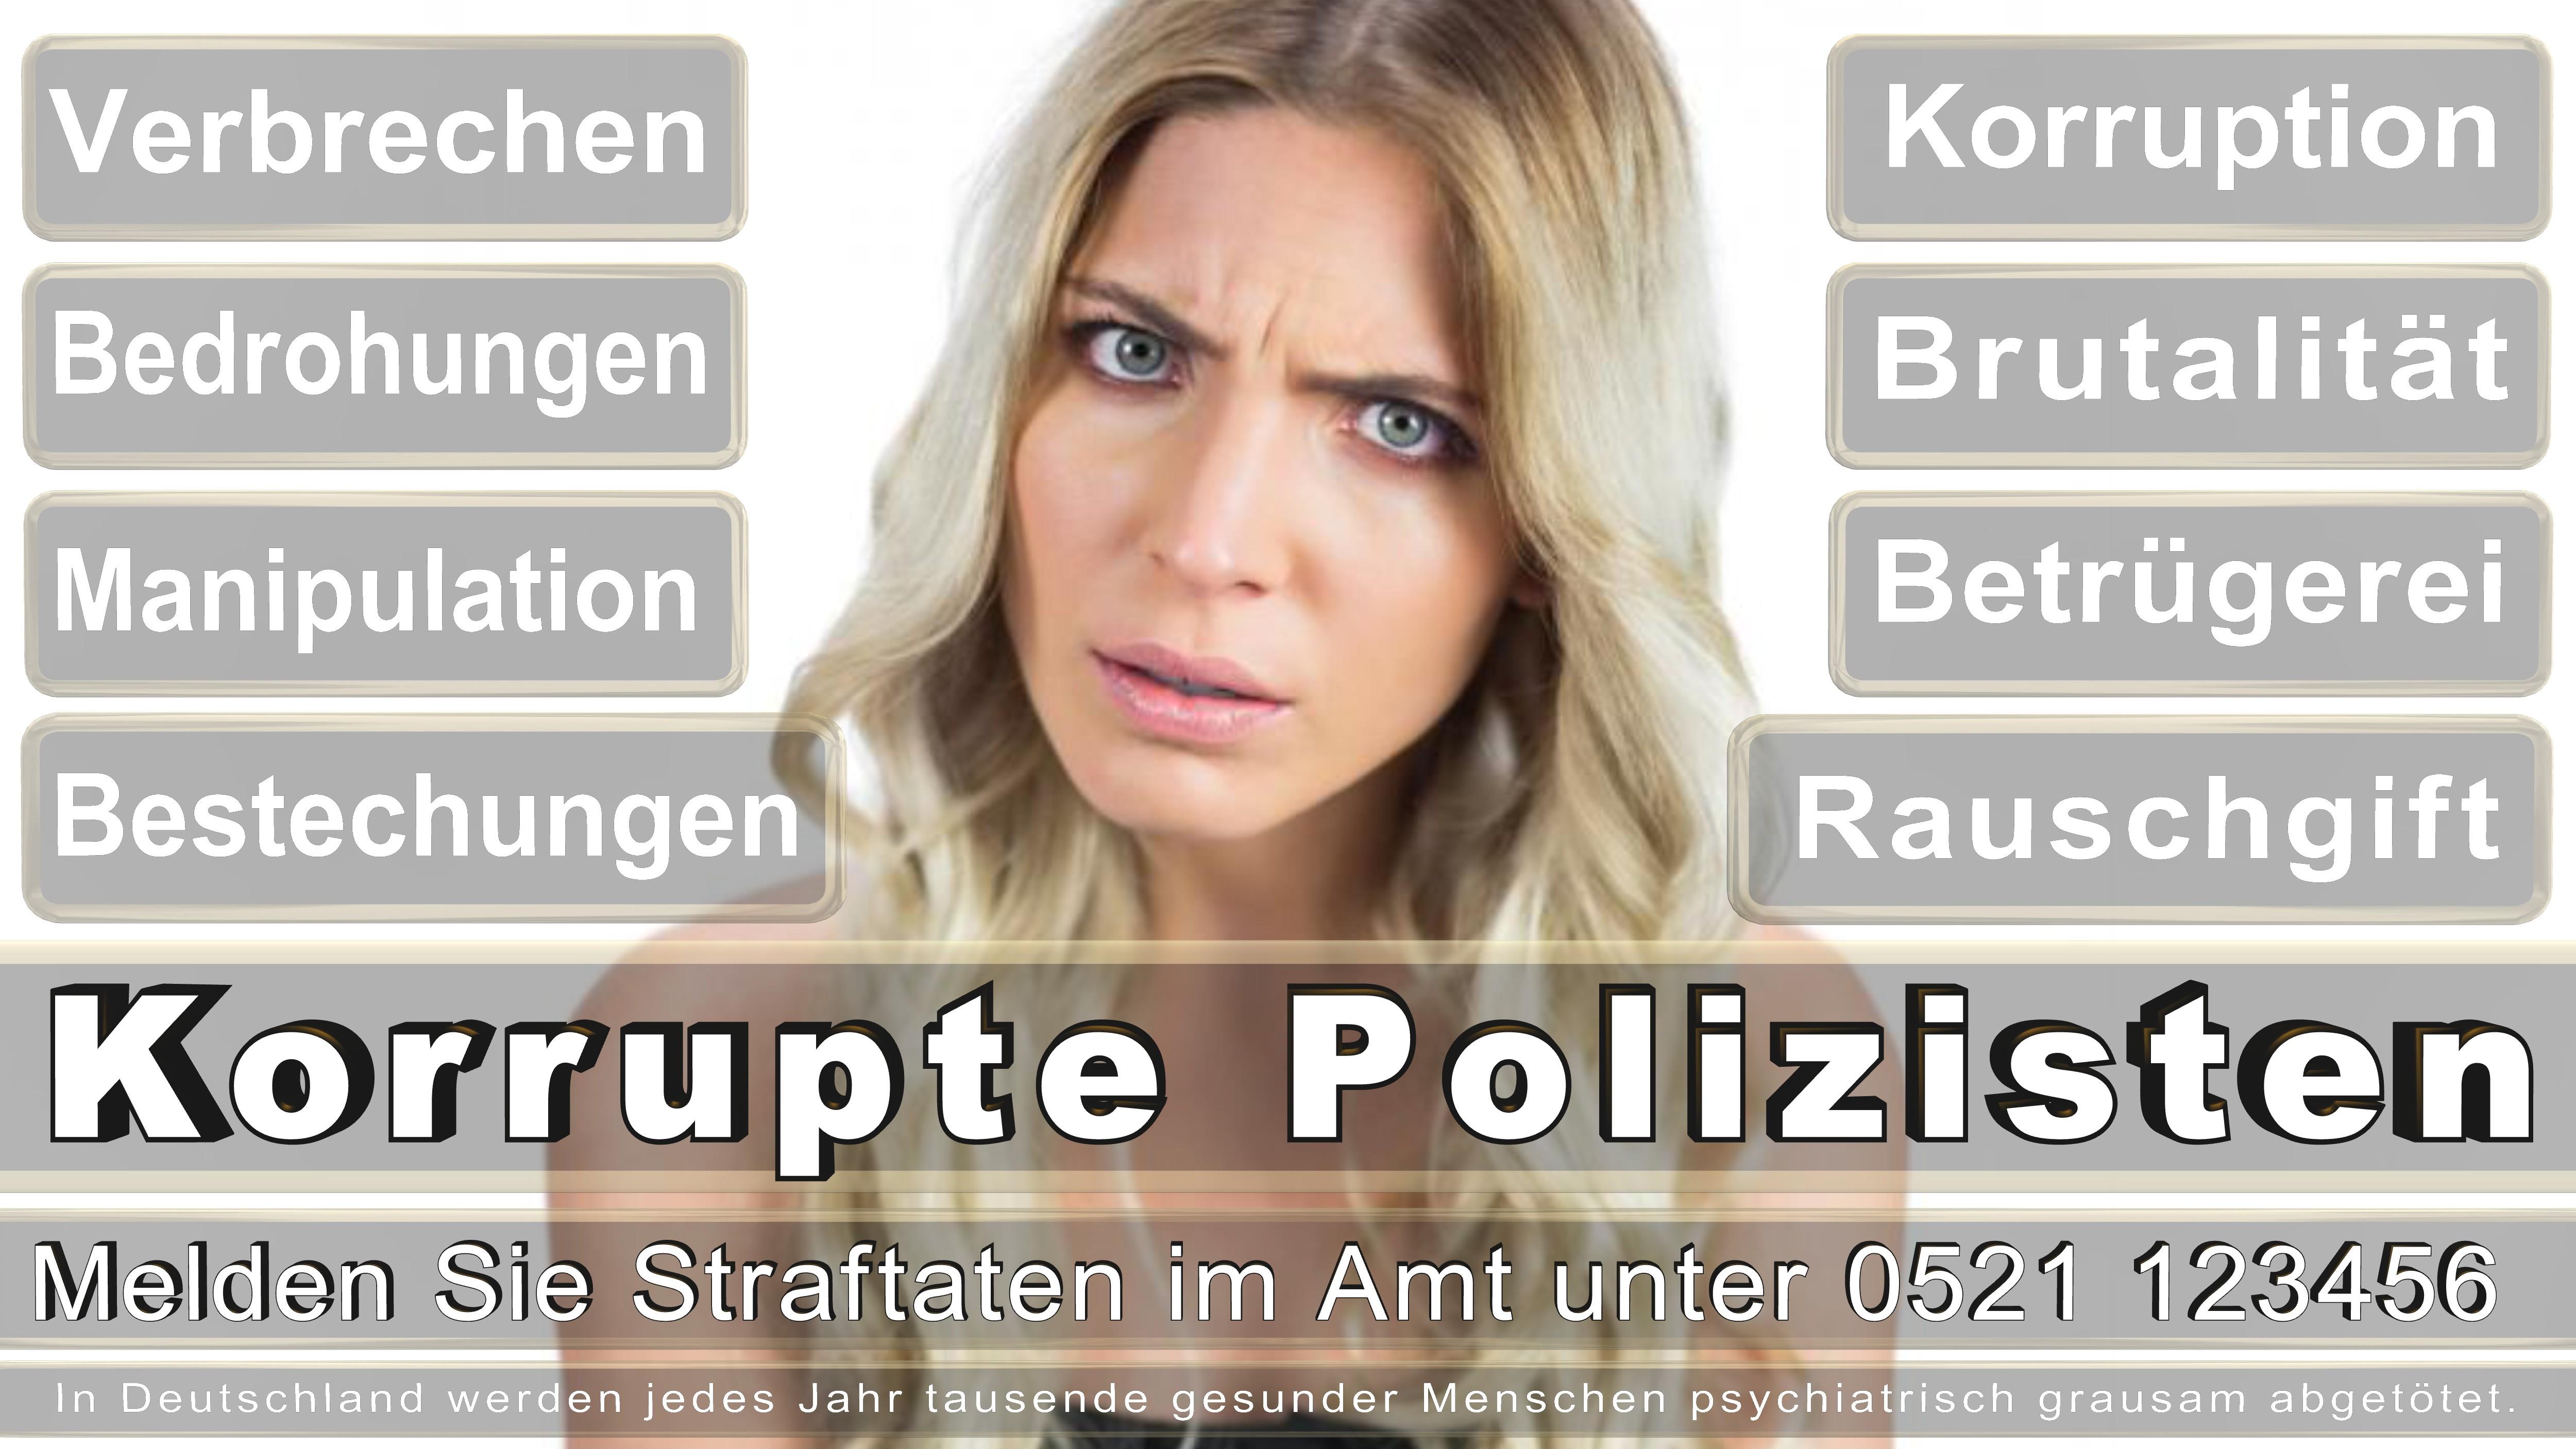 Polizei-Bielefeld-Polizei-Bielefeld-Polizei-Bielefeld (196)